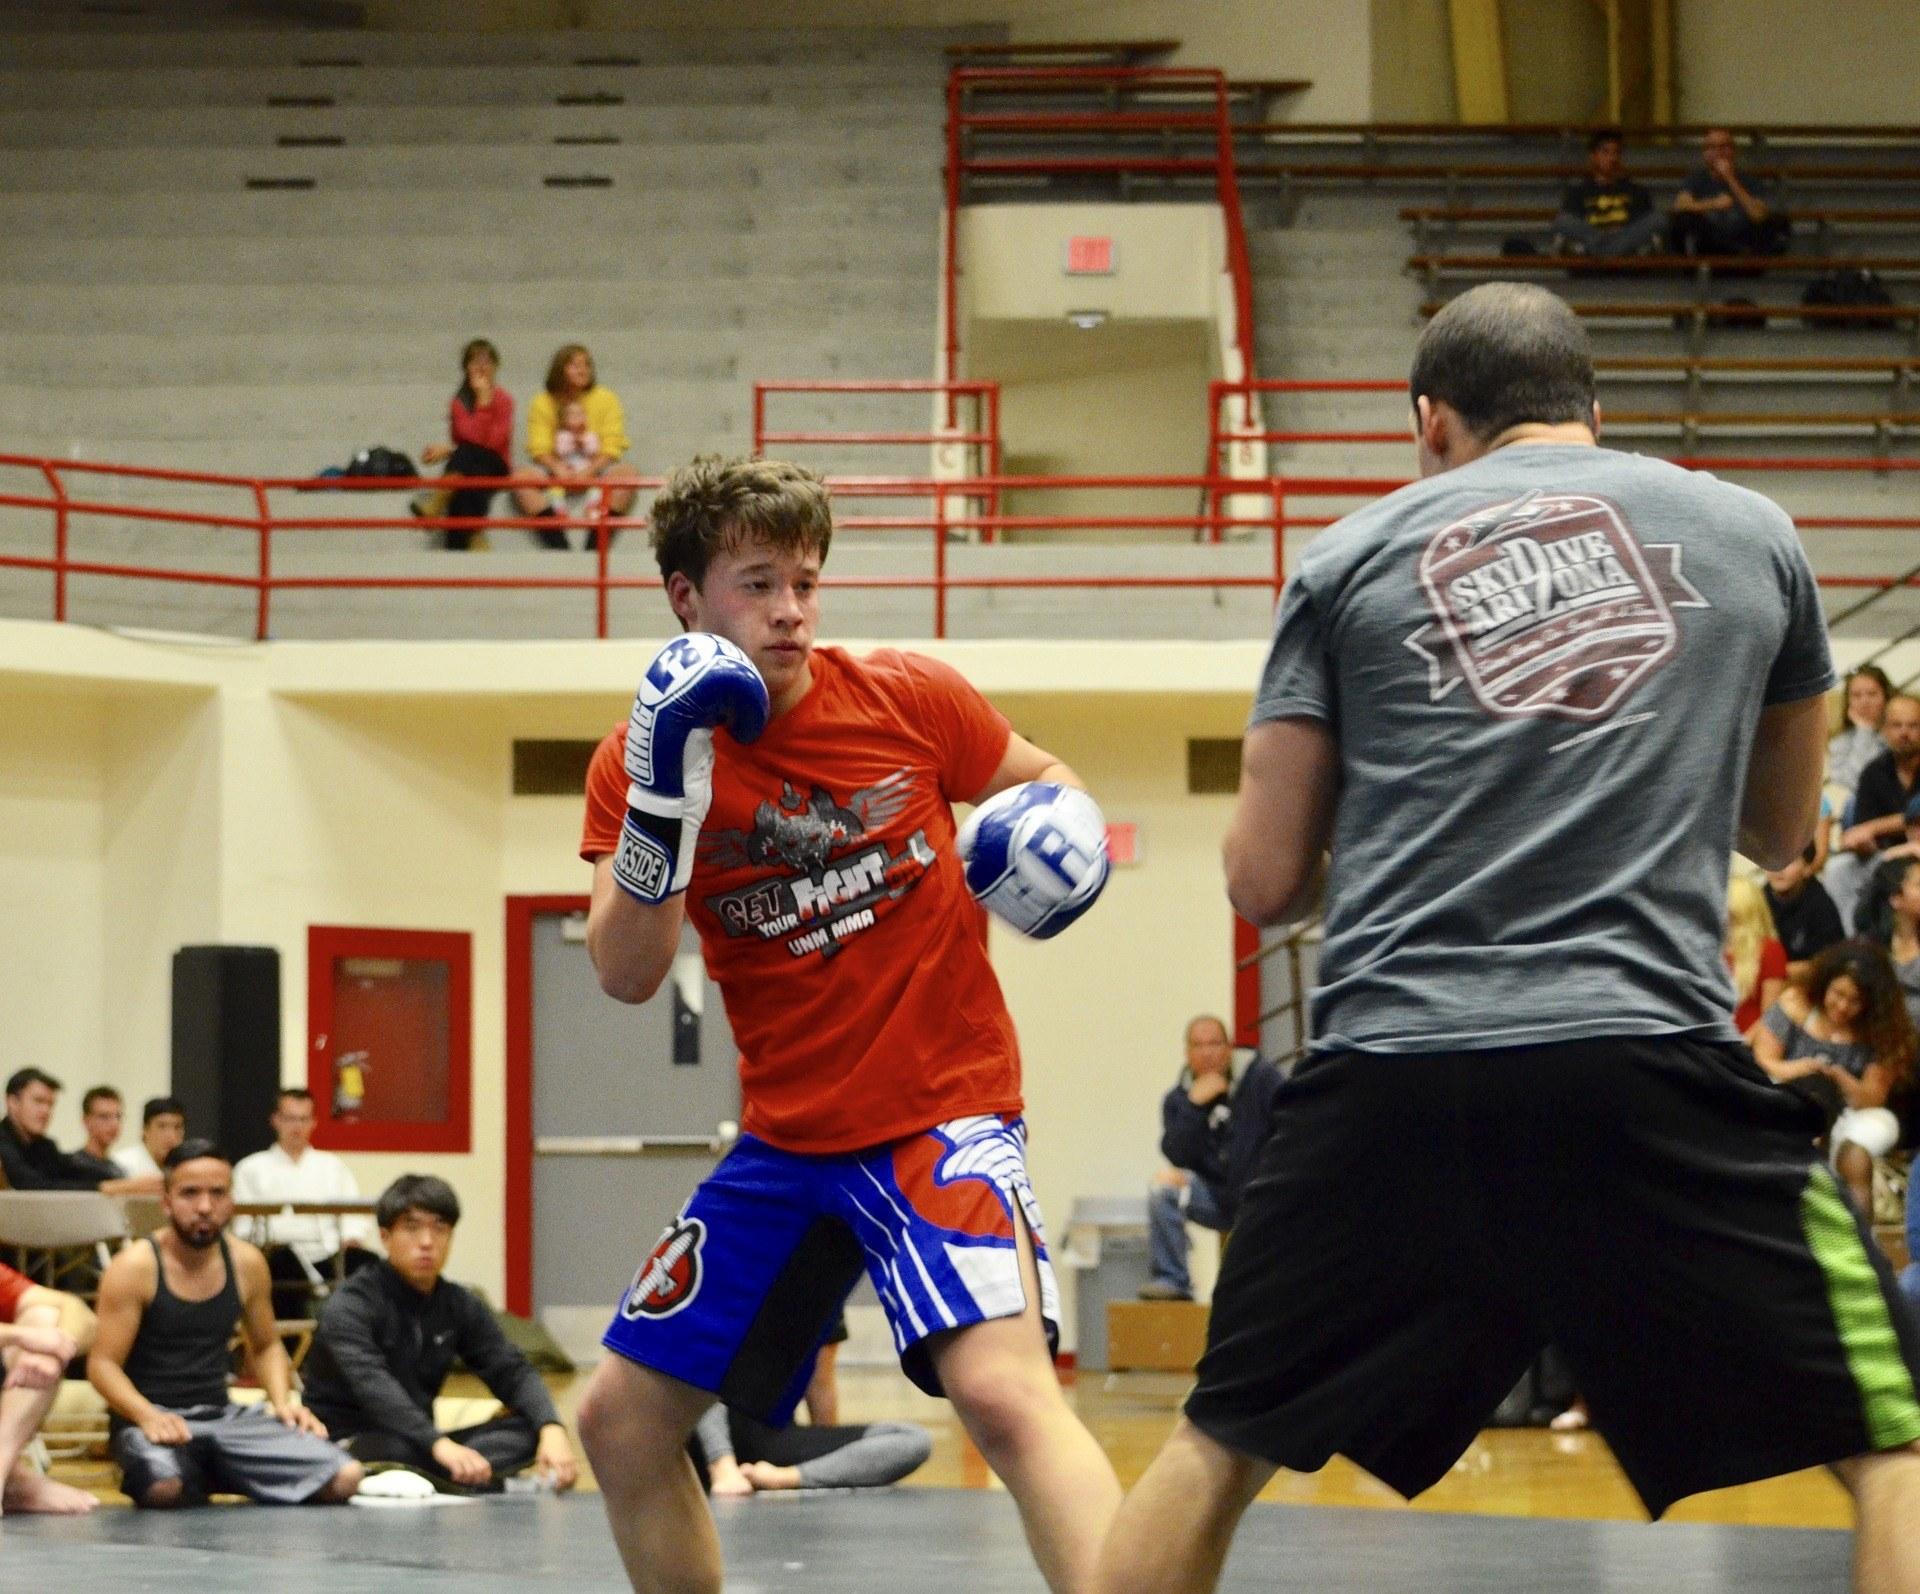 boxing footwork